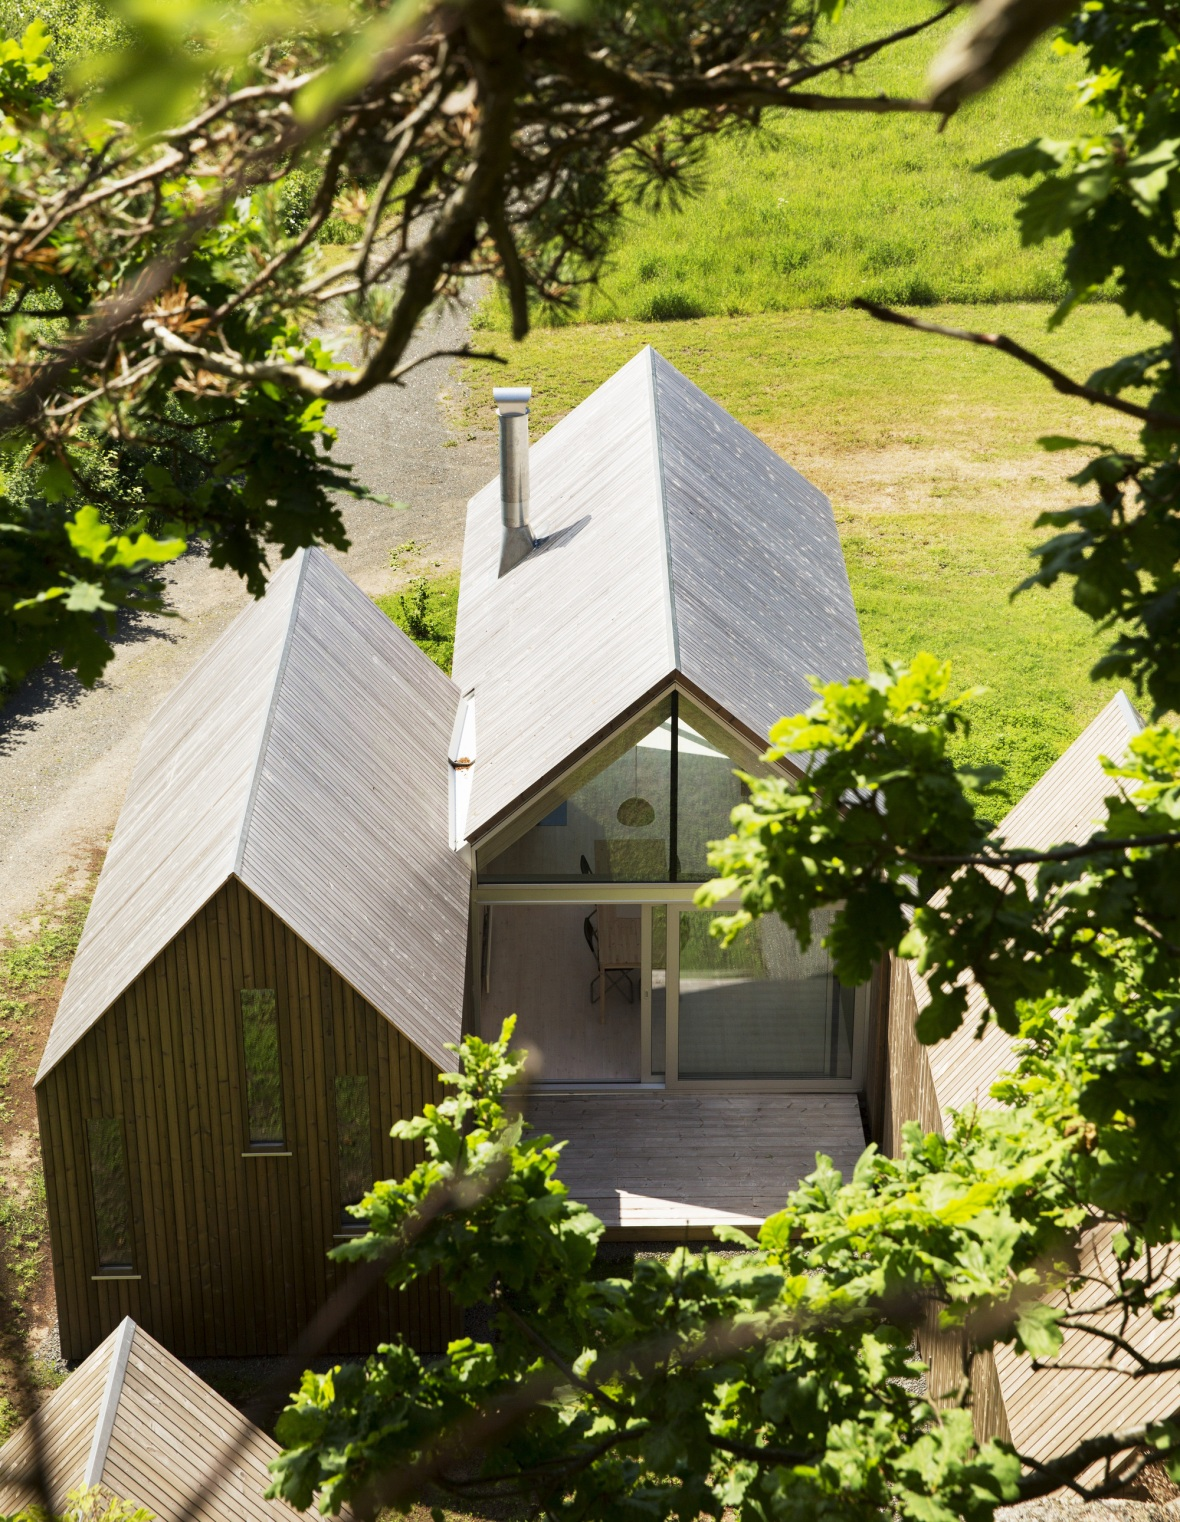 reiulf-ramstad-micro-cluster-cabins-8